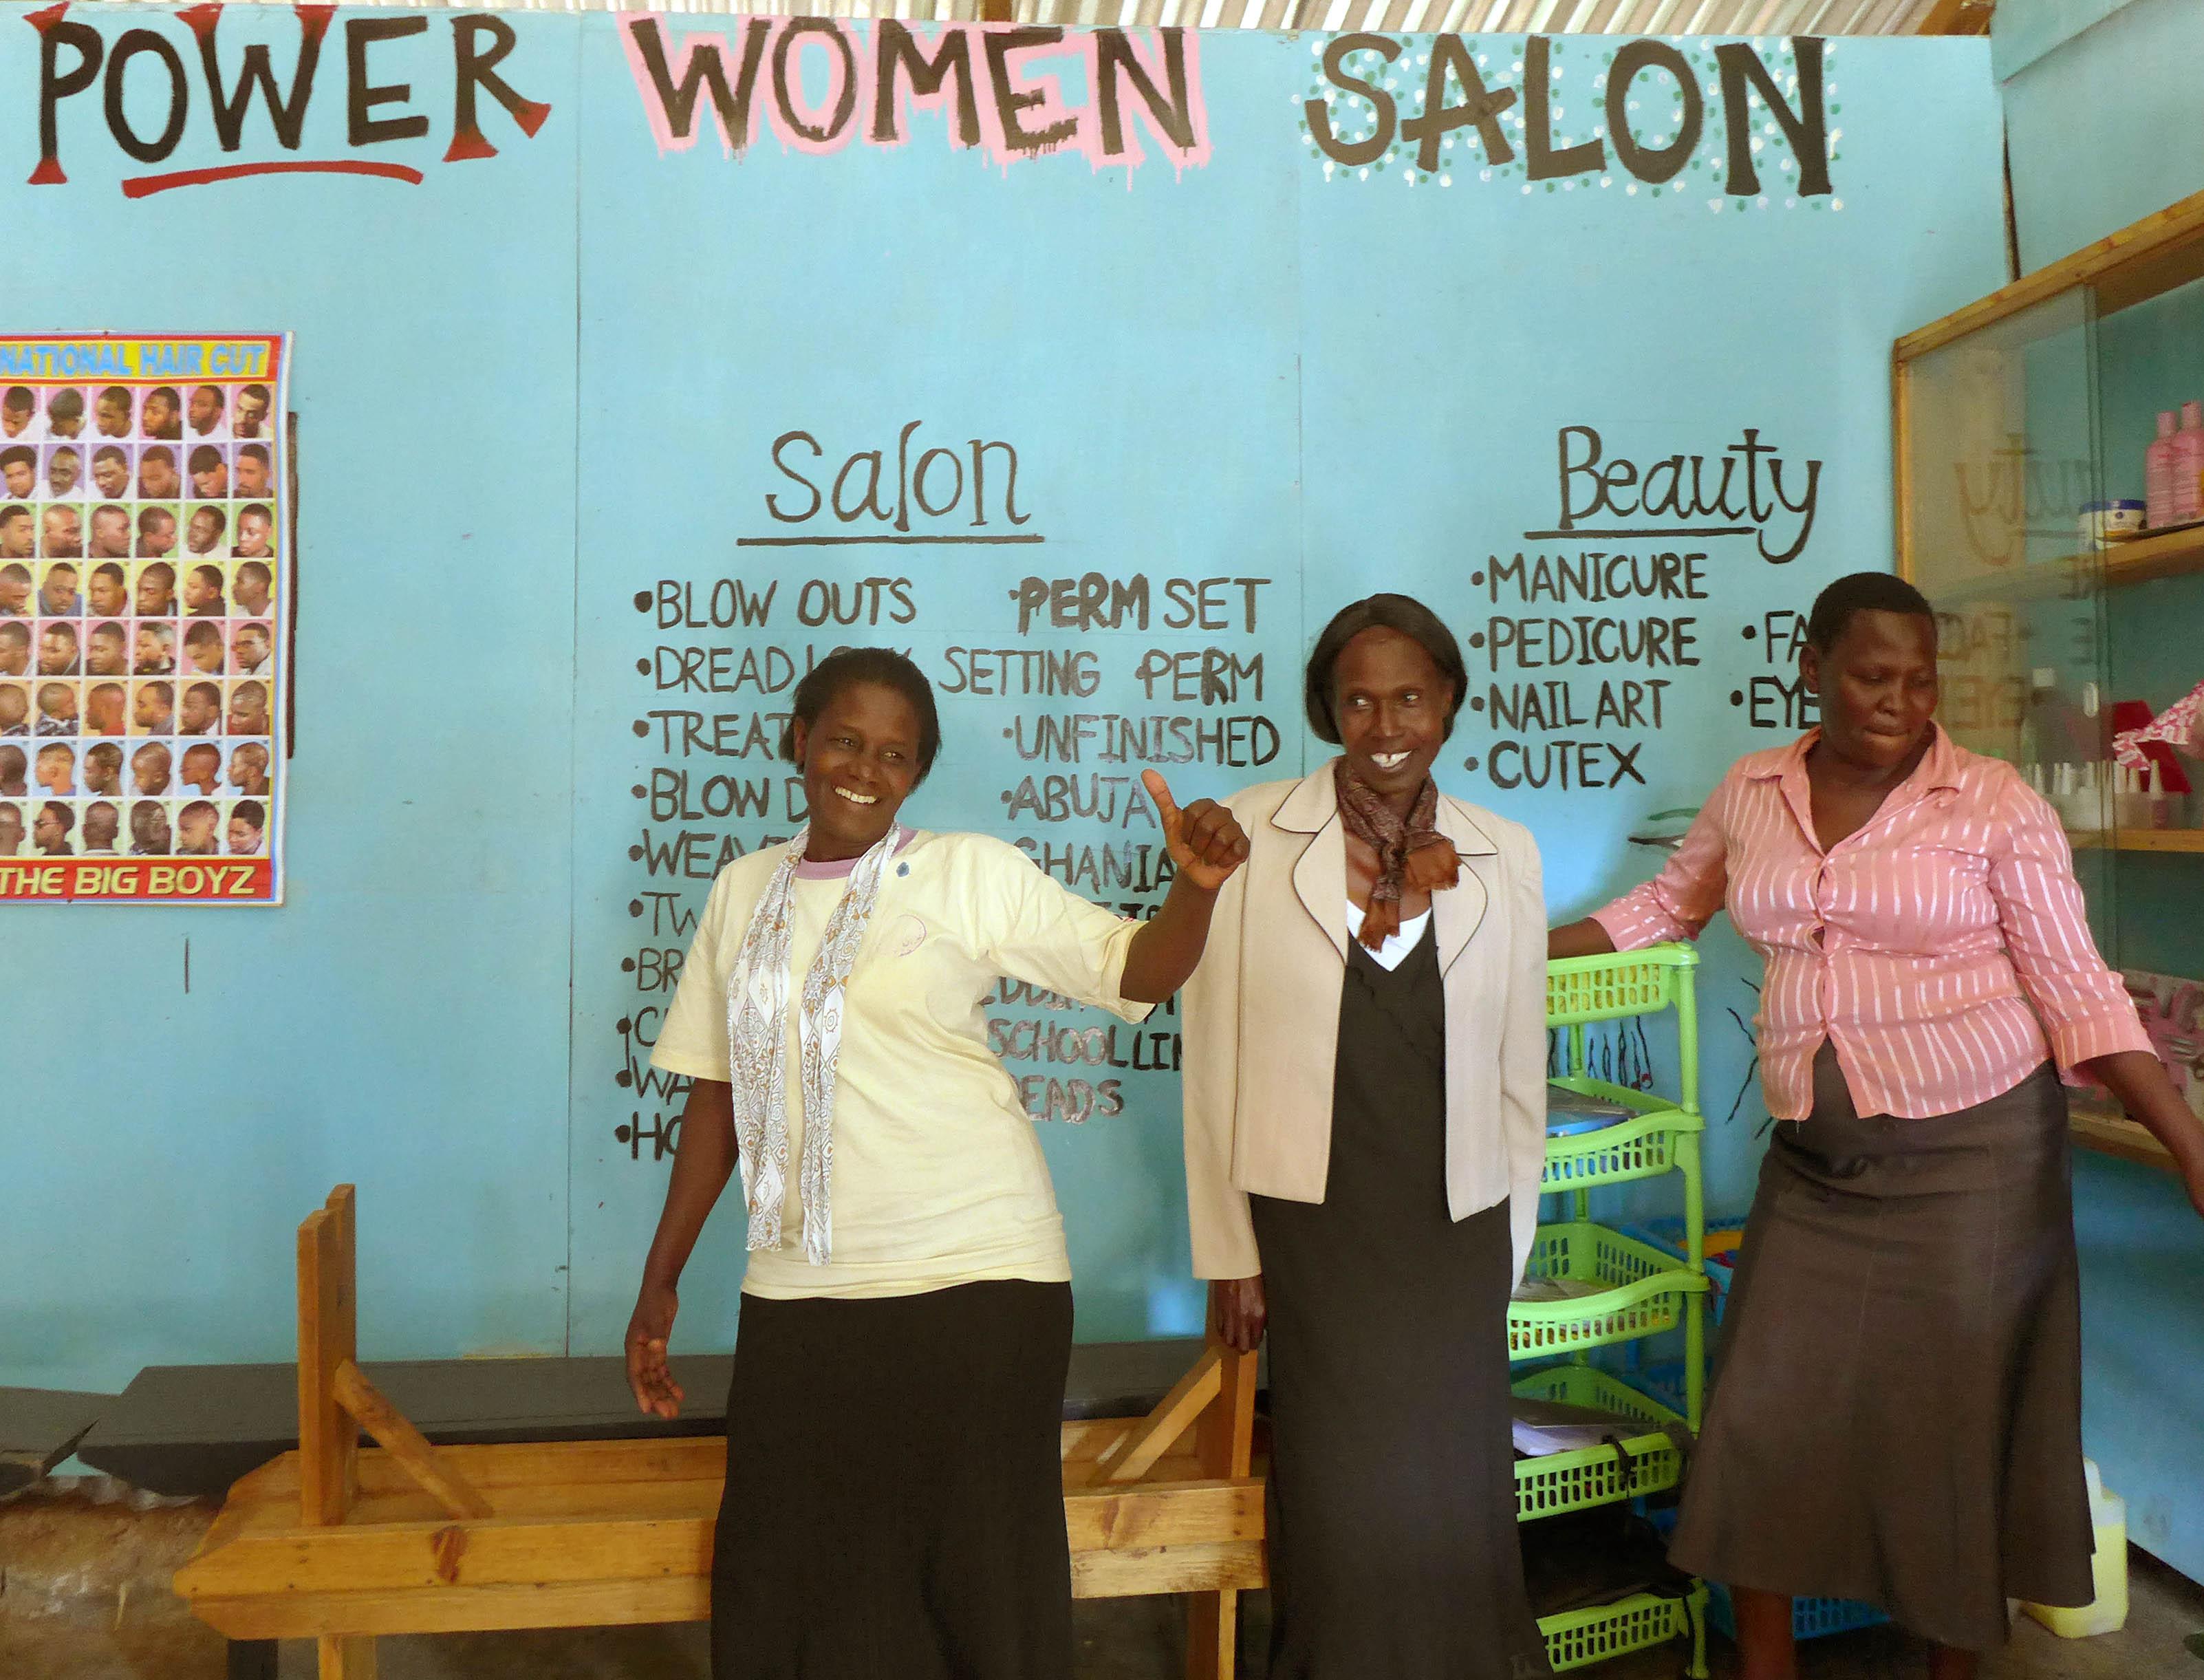 Power Women's Hair Salon